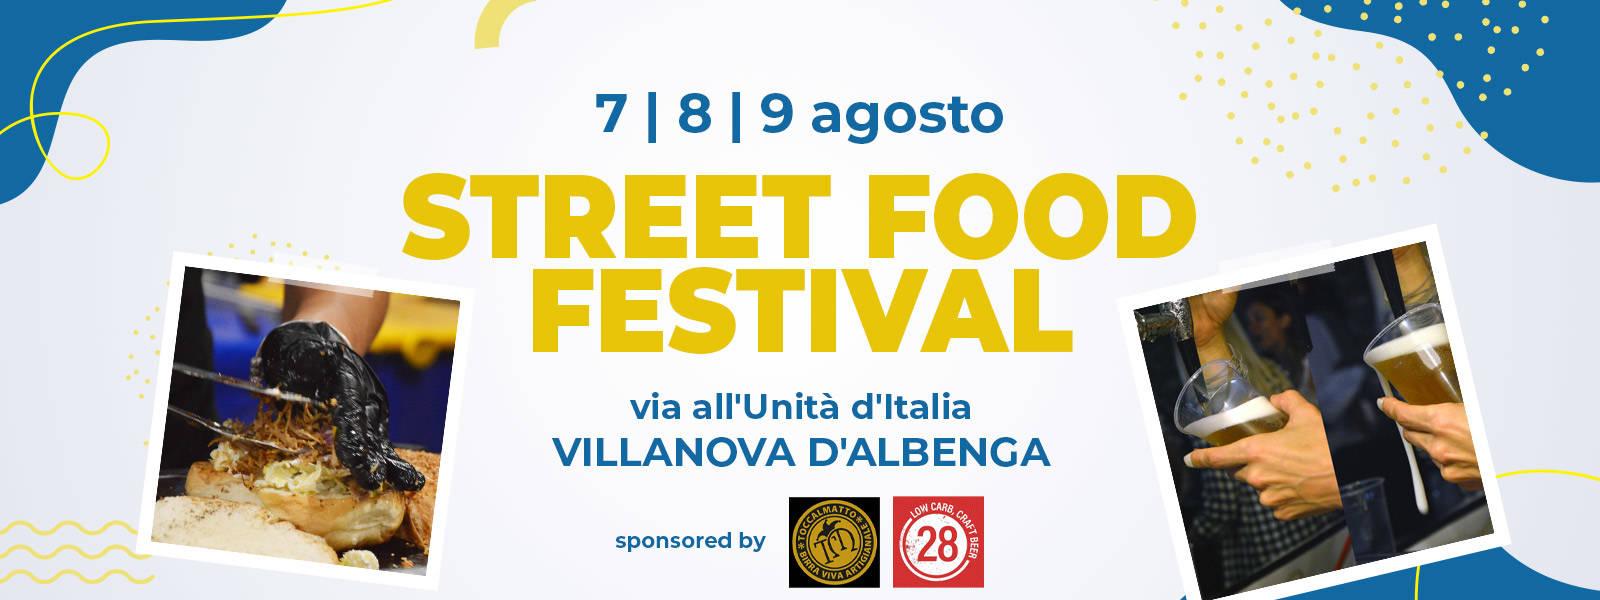 Street Food Festival Villanova D'Albenga 2020